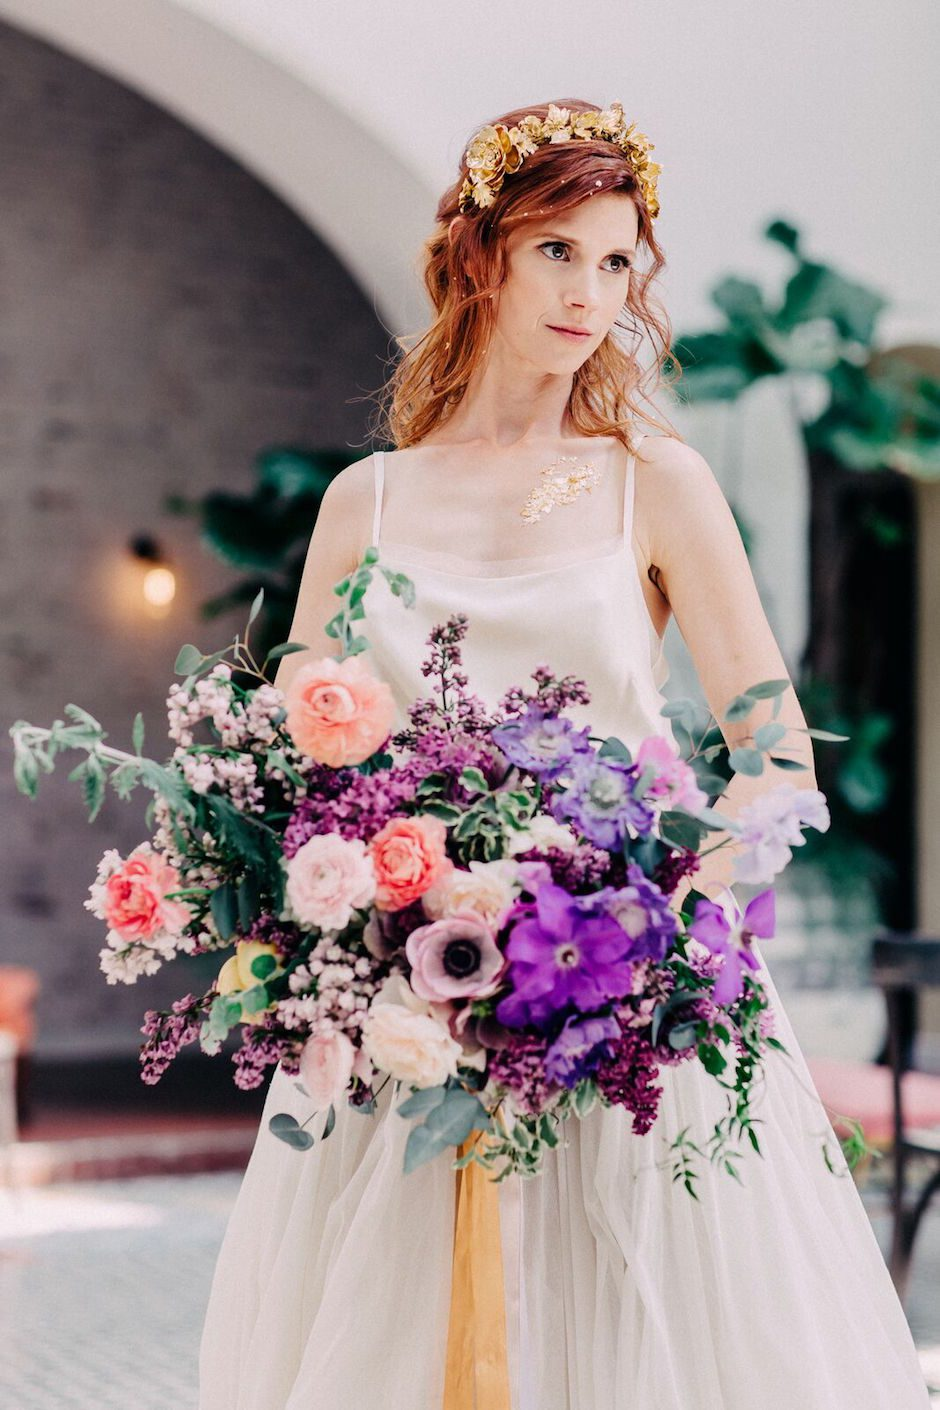 EbellofLongBeach-RevelPetals-HailleyHowardPhotography-WeddingChicks3